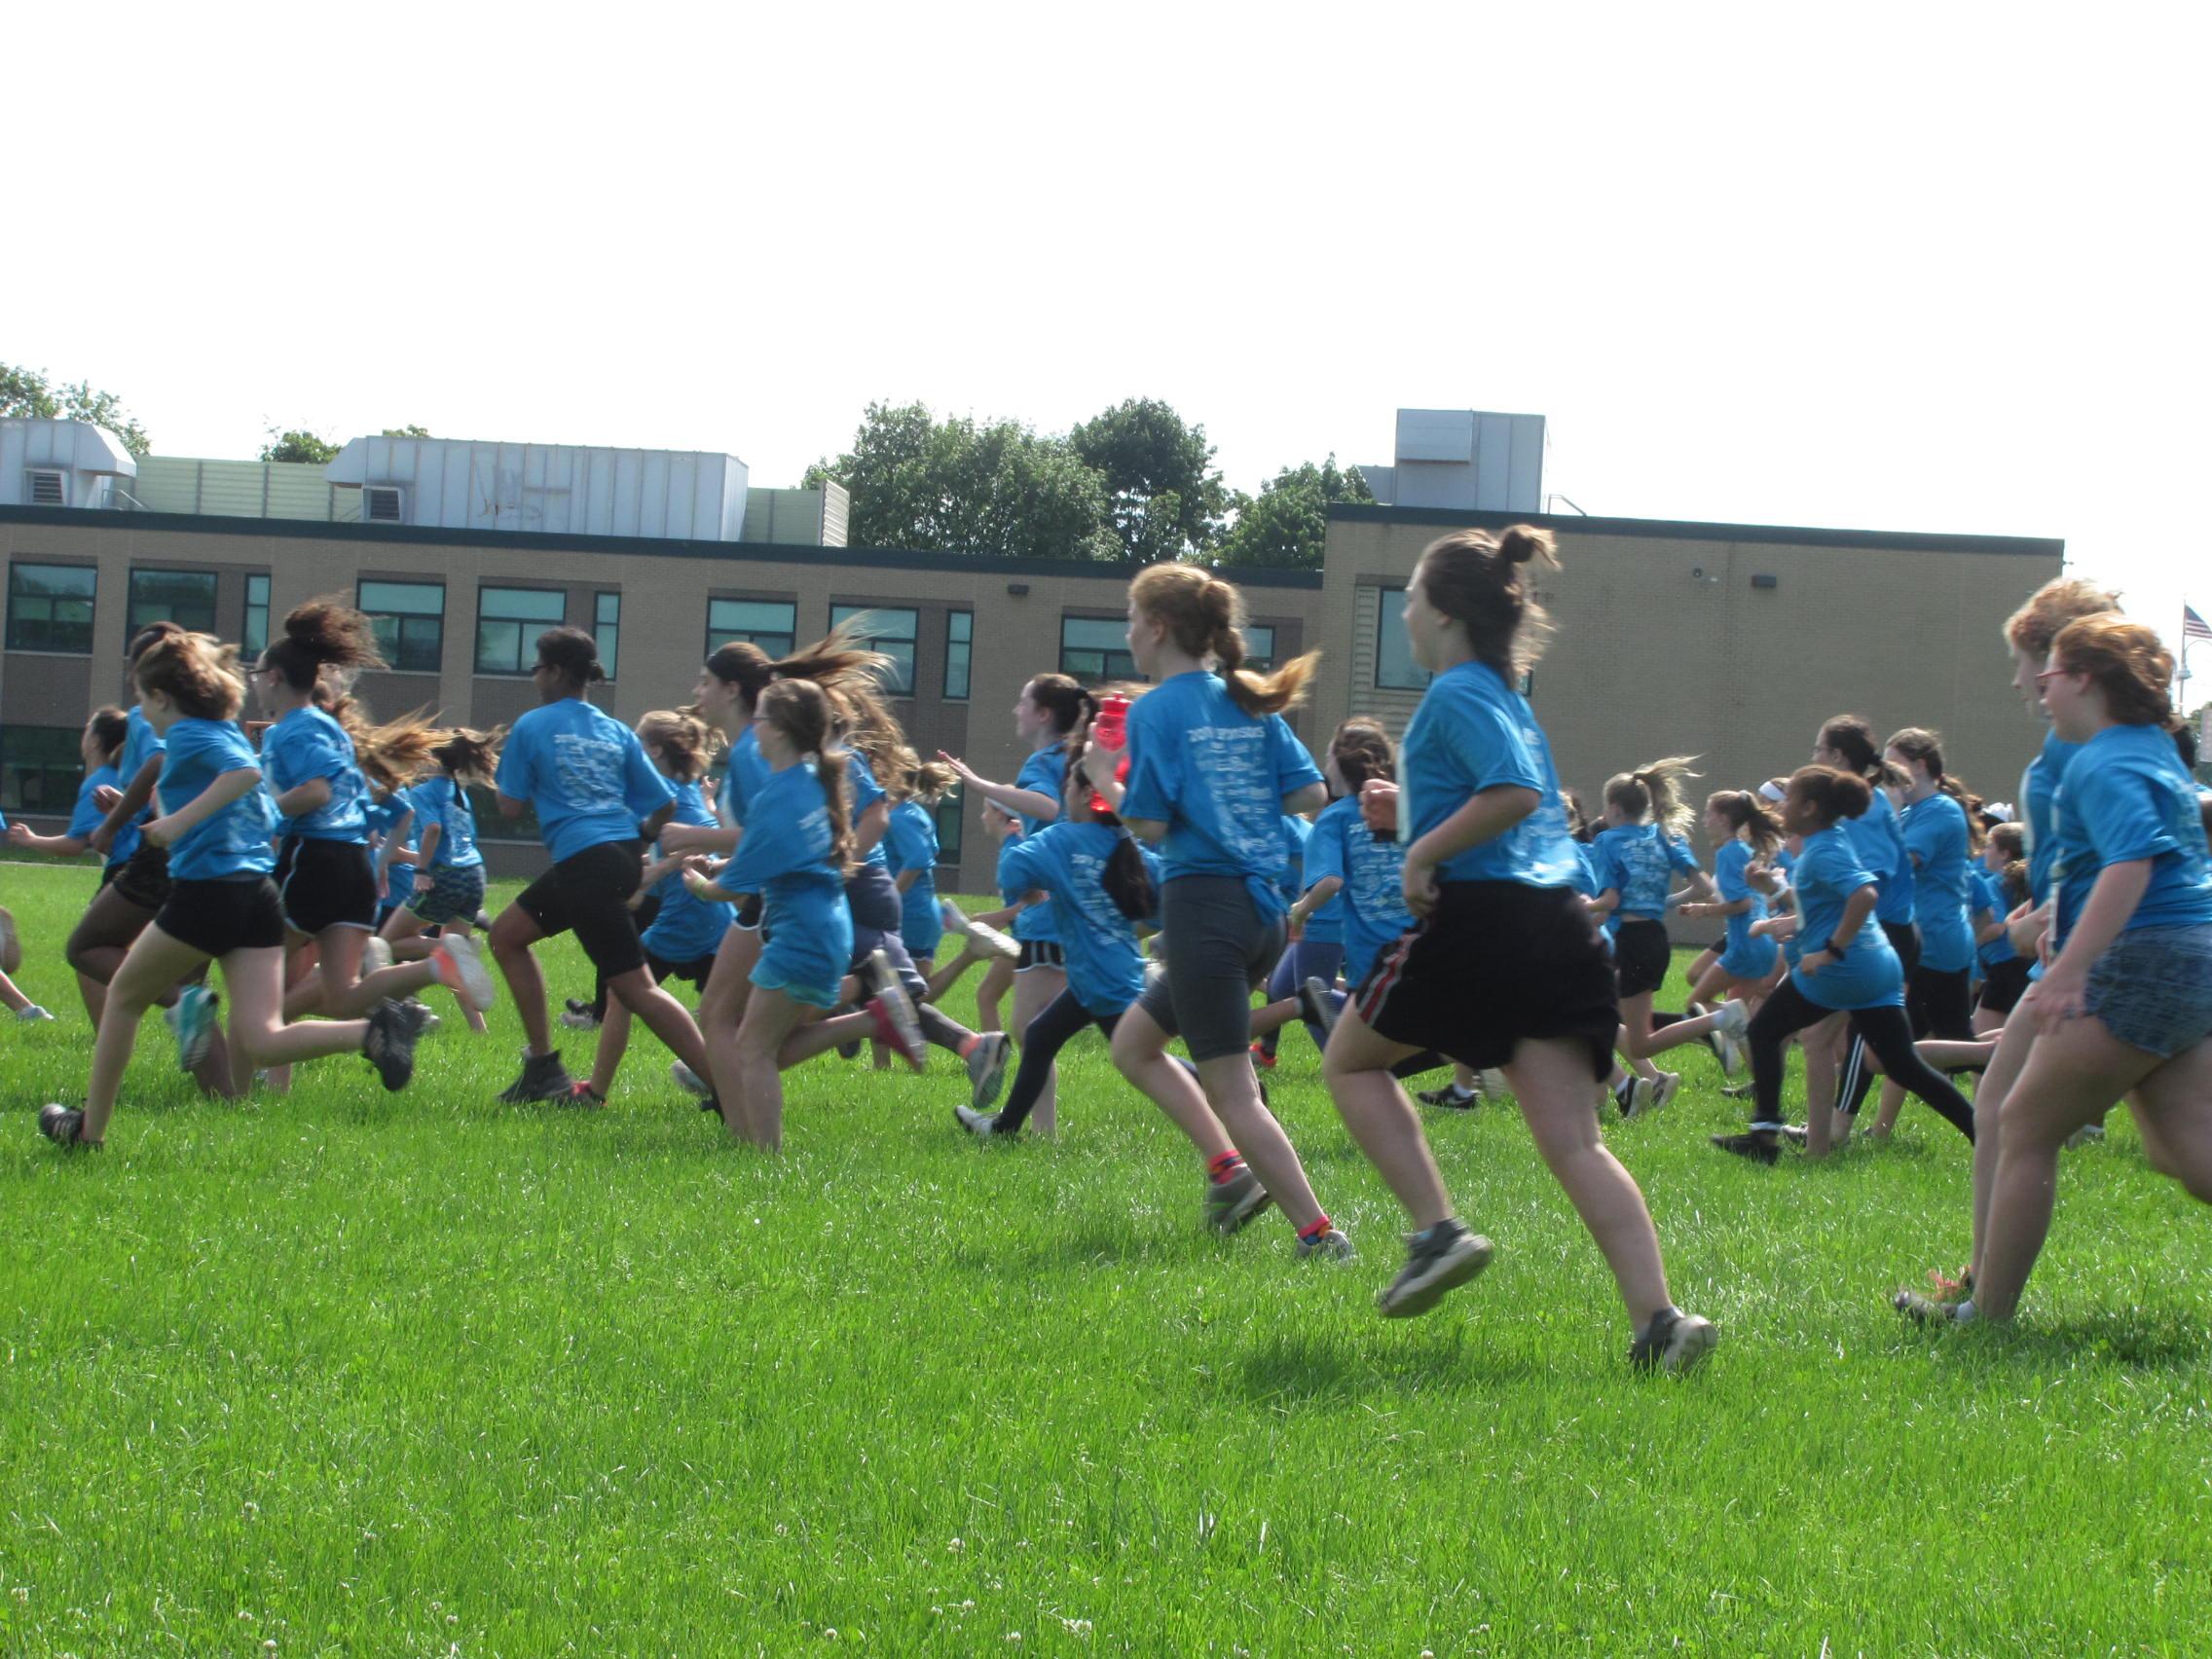 Fun Run with group of kids running